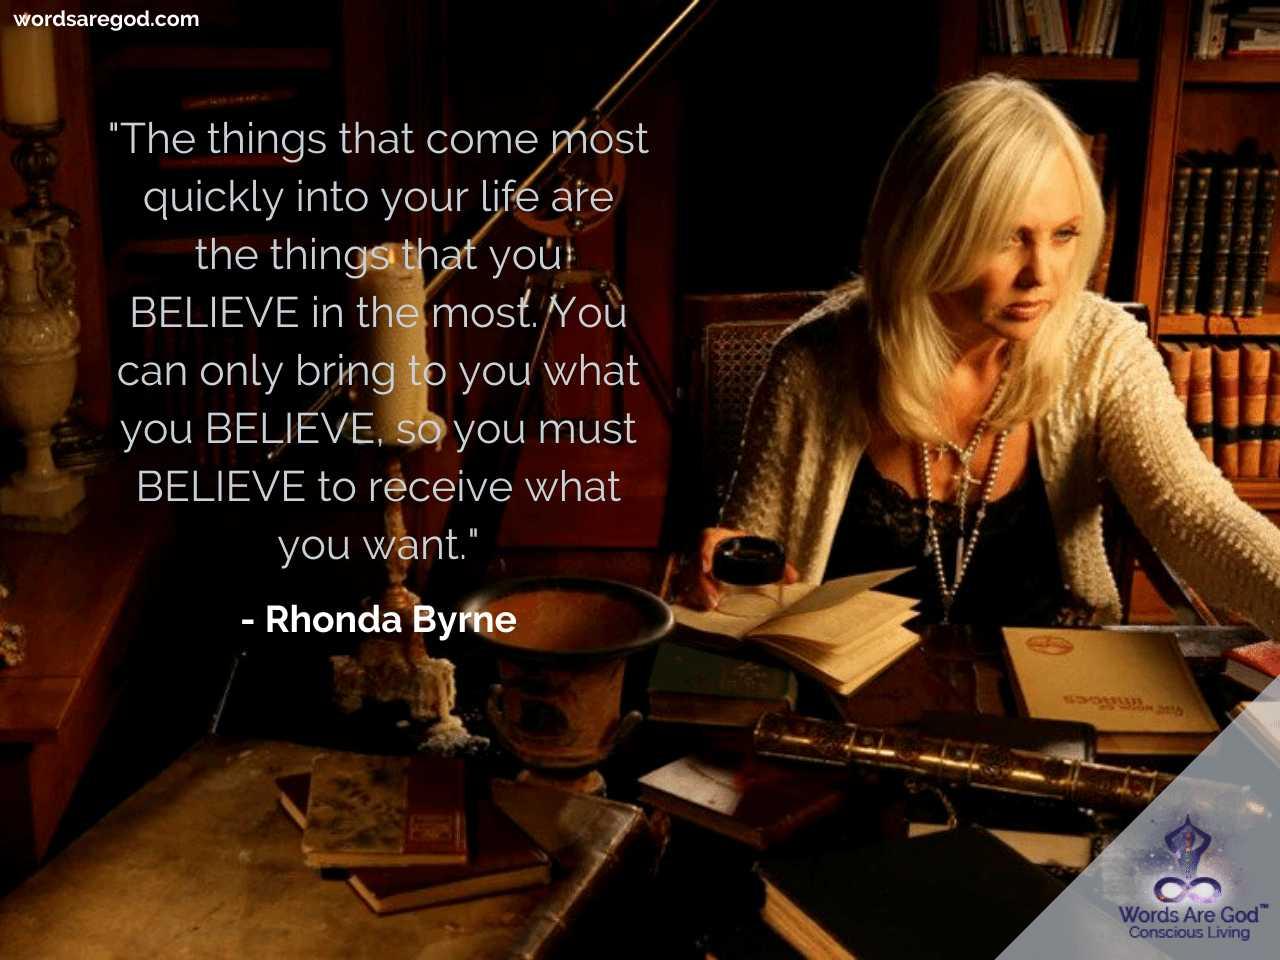 Rhonda Byrne Inspirational Quotes by Rhonda Byrne